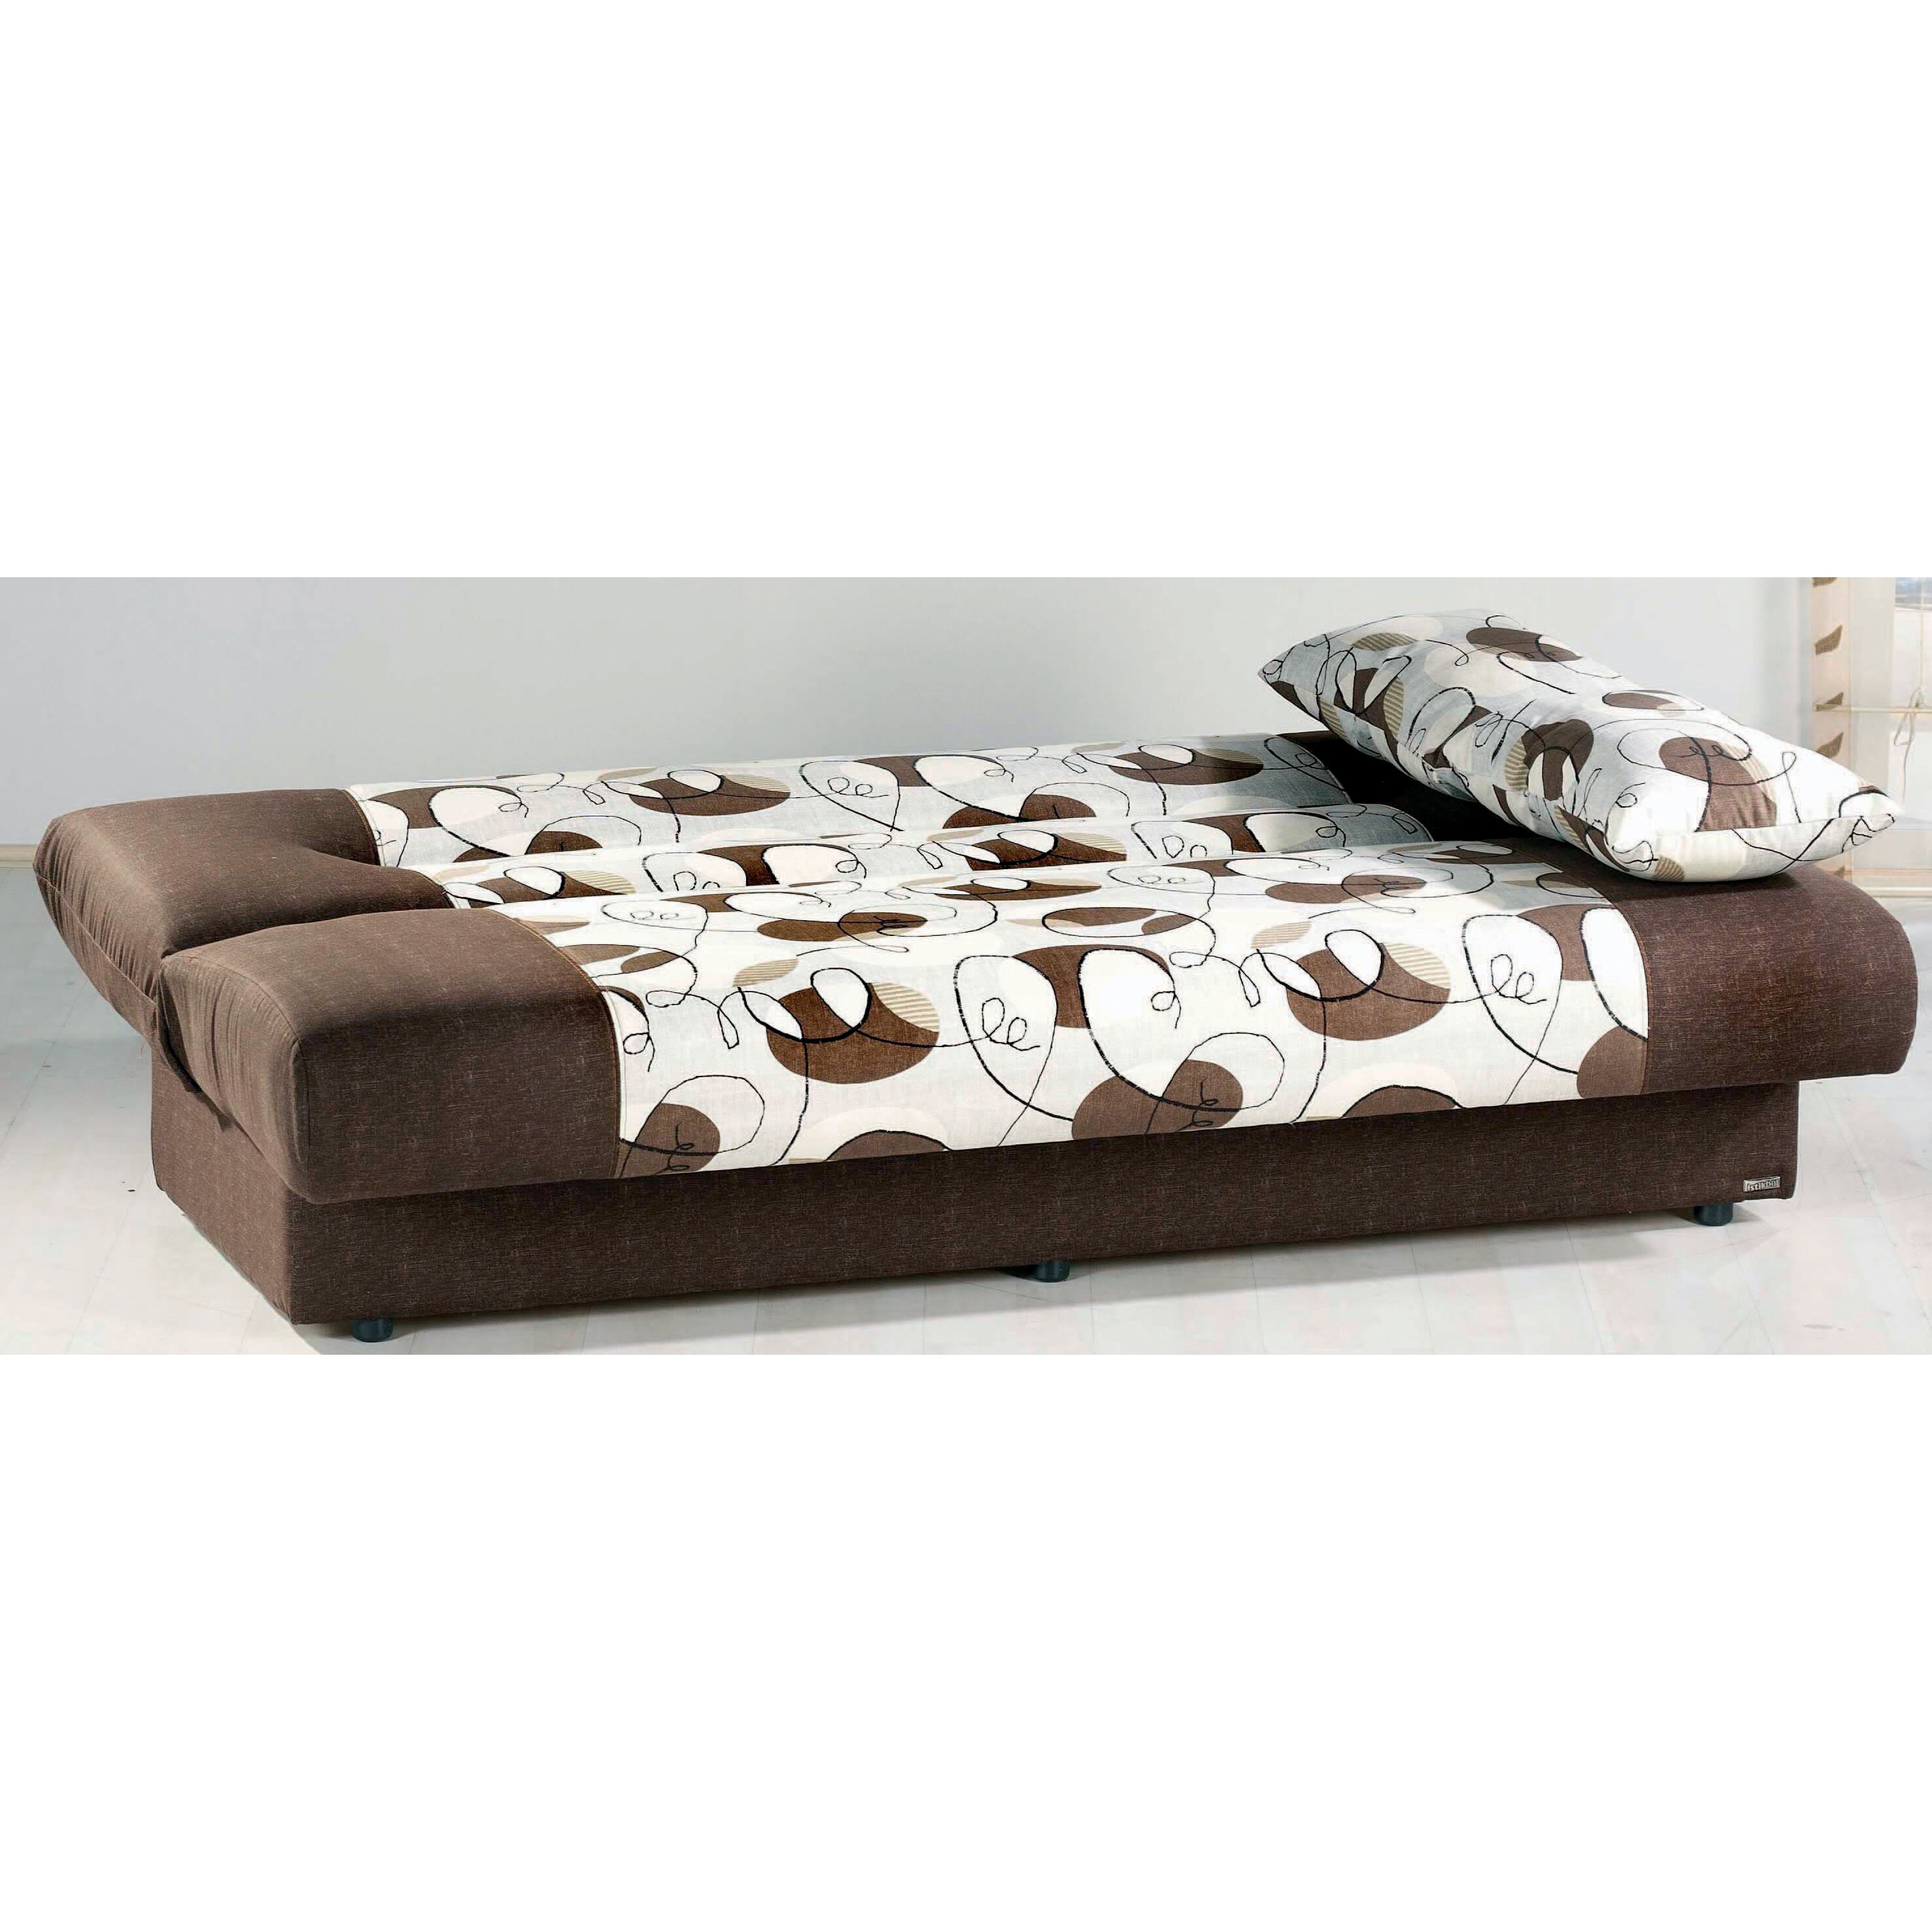 Istikbal Regata Sleeper Sofa Amp Reviews Wayfair